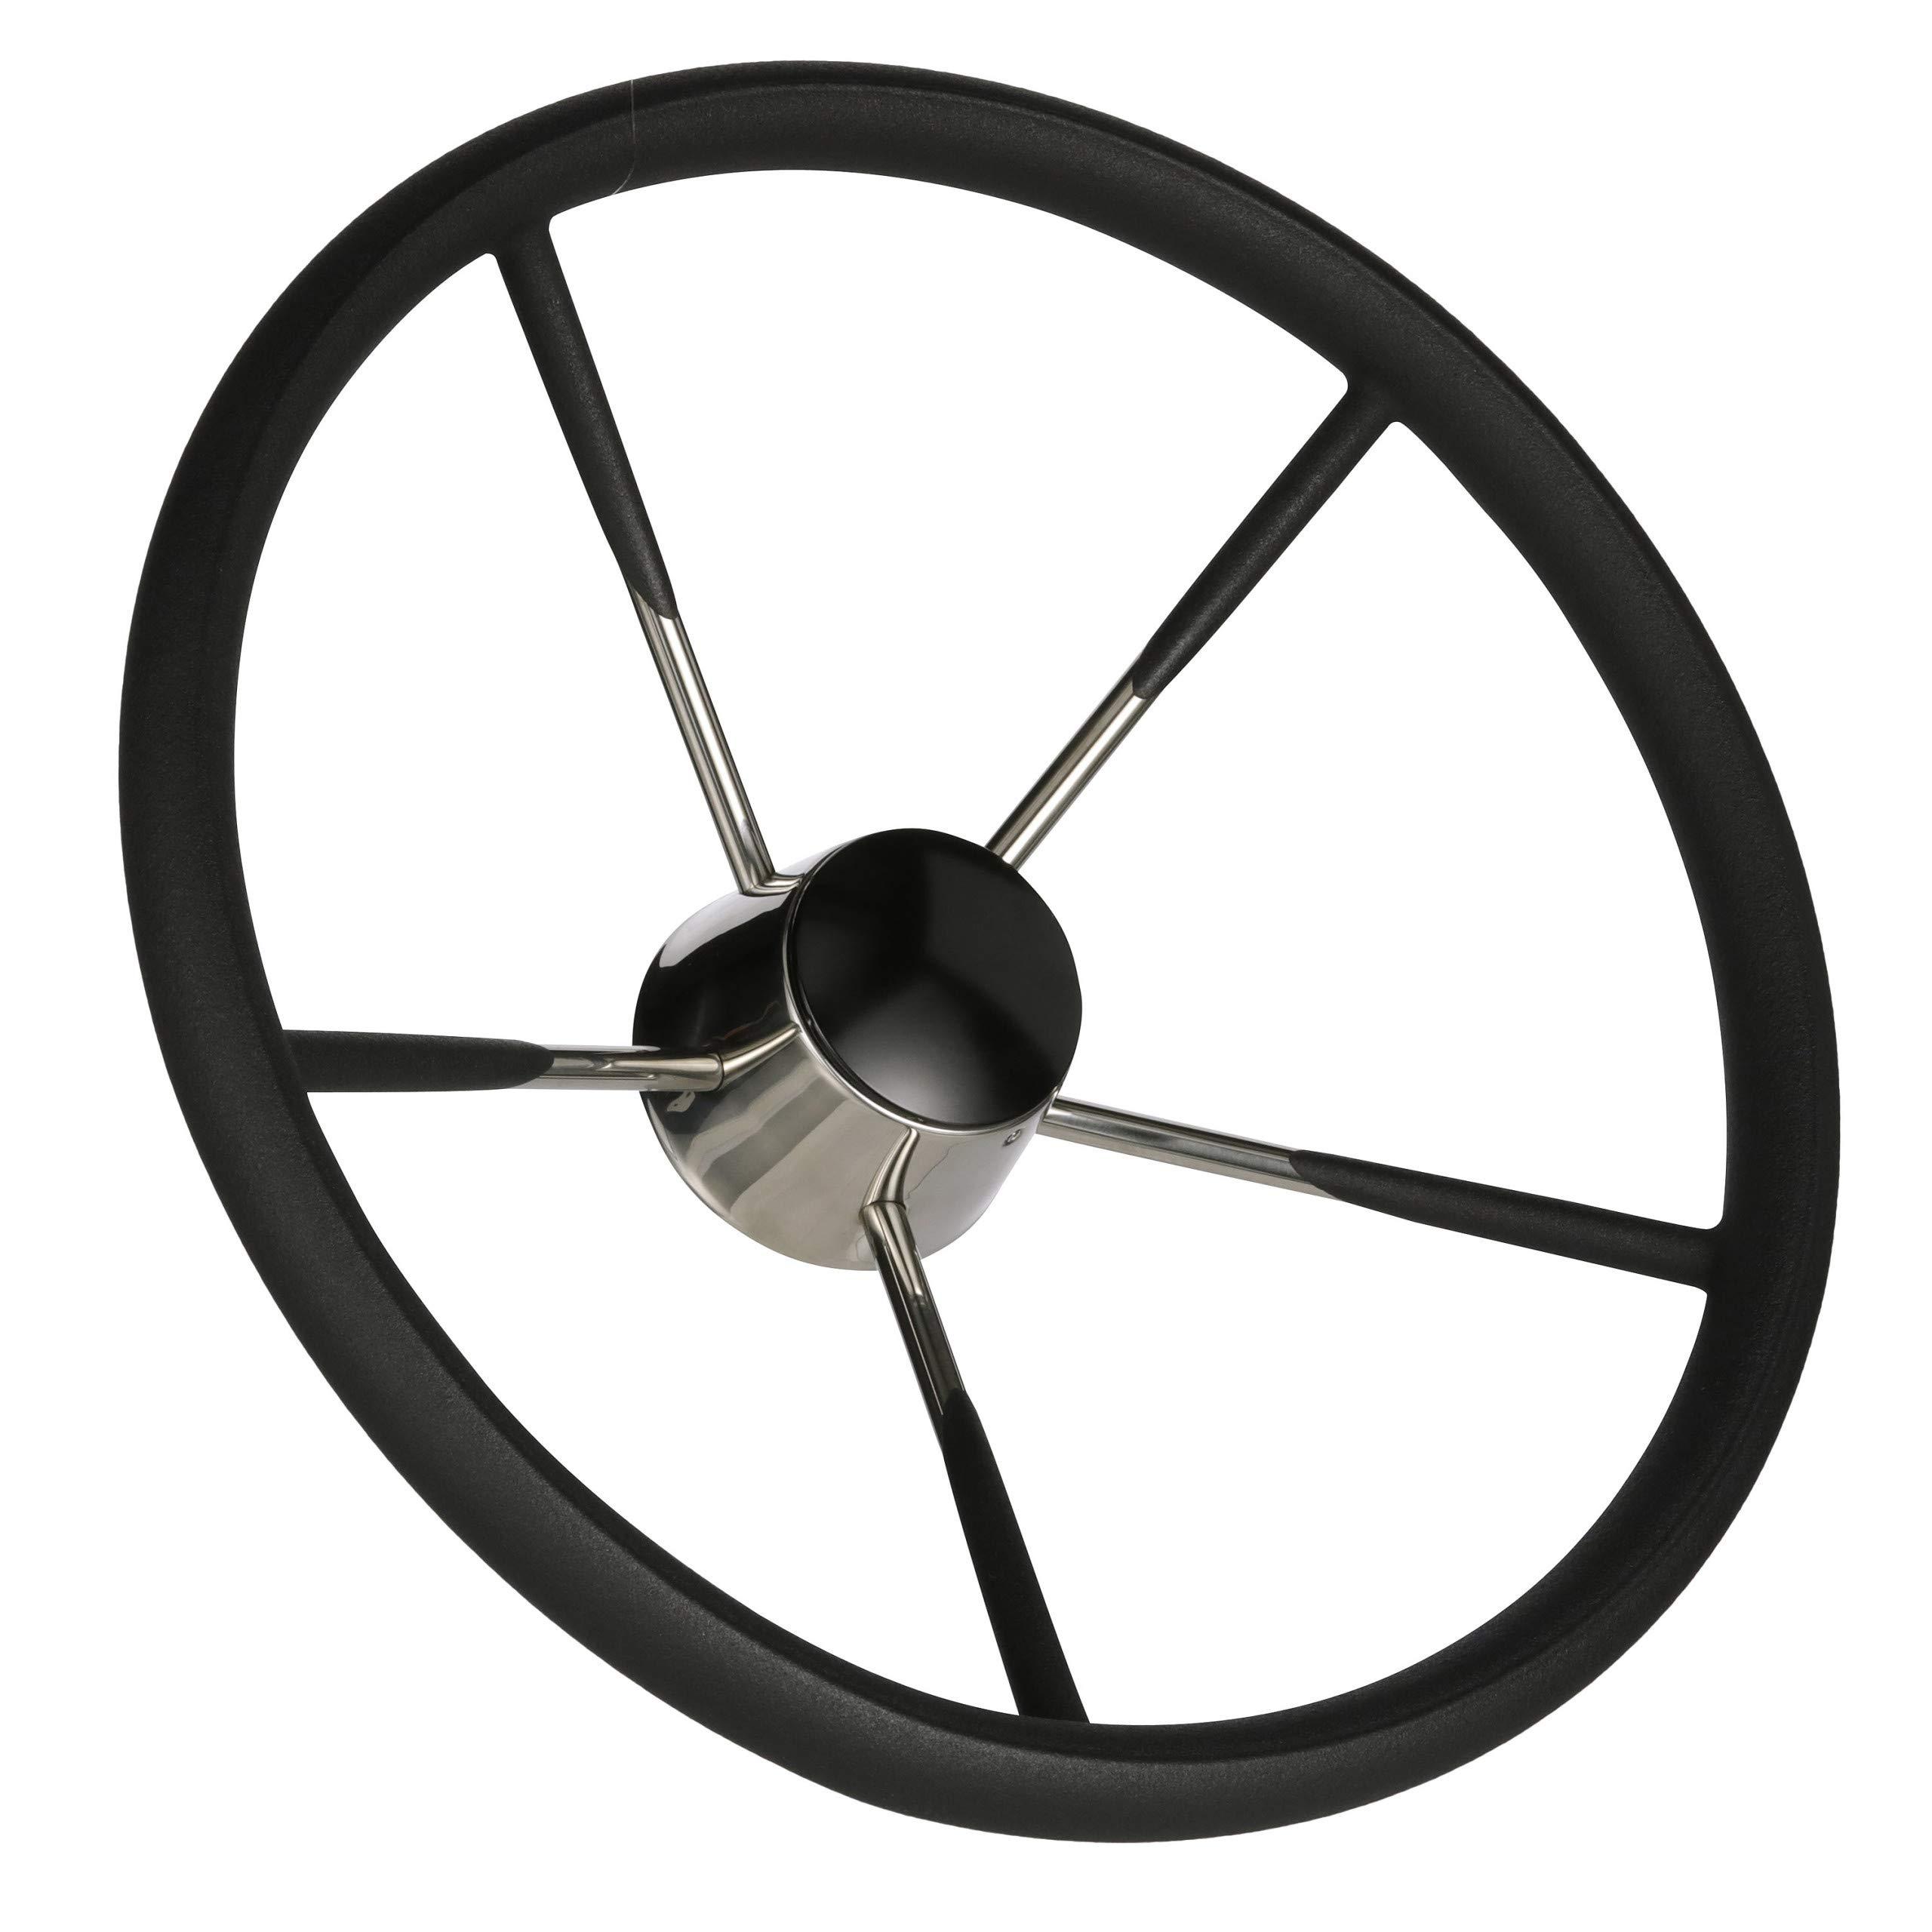 Seachoice 28581 5-Spoke Destroyer Steering Wheel with Permanent Foam Grip - Stainless Steel - Black Center Cap, 15-inch Diameter by SEACHOICE